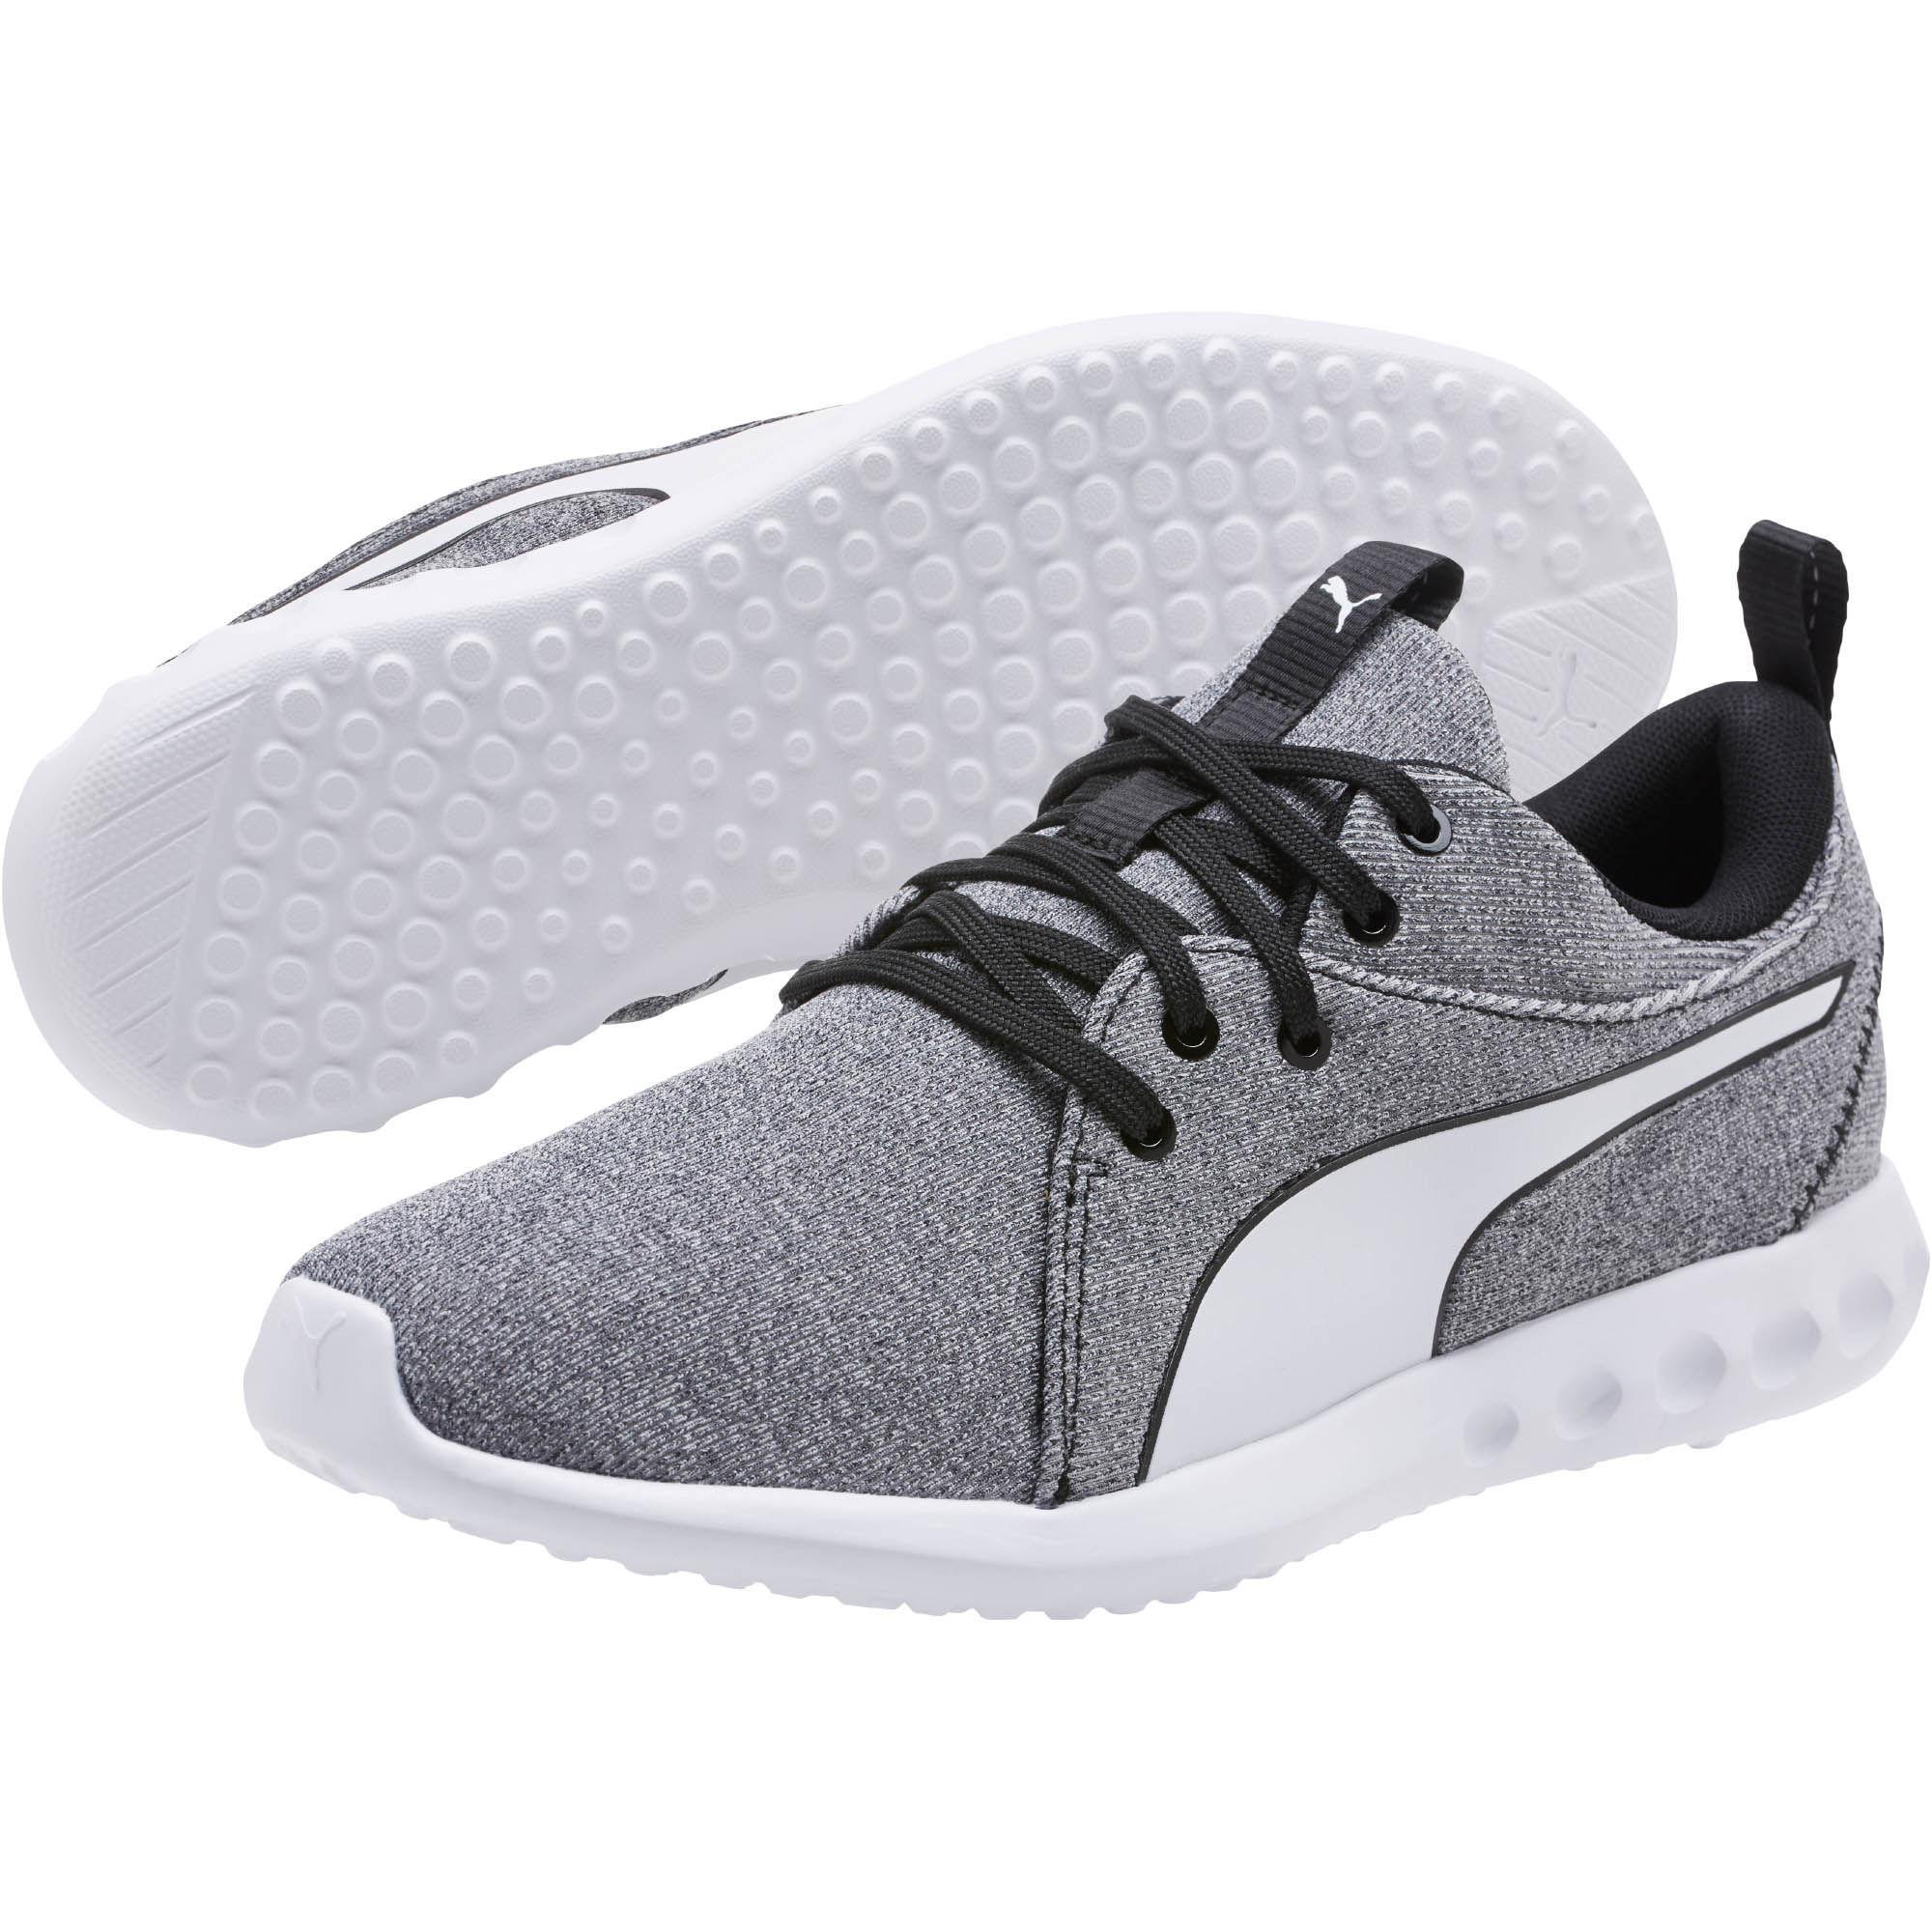 3a7367c6a5e Lyst - PUMA Carson 2 Nautical Women s Running Shoes in Black